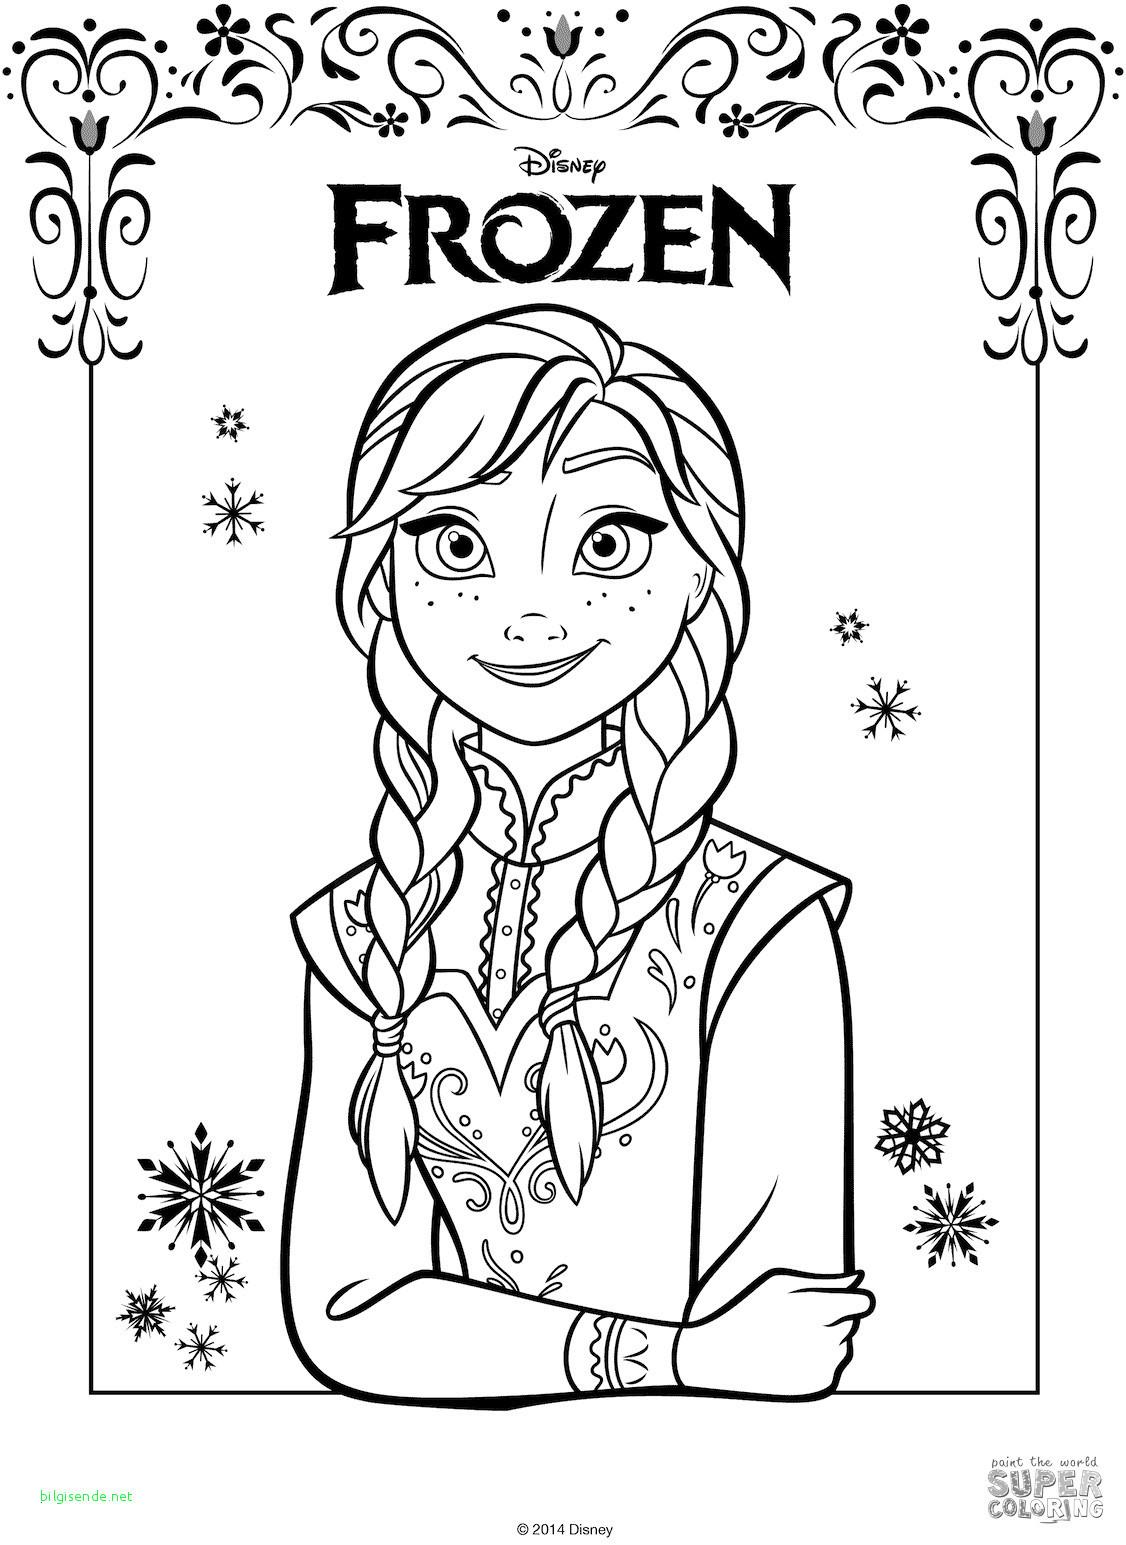 Disney Prinzessin Ausmalbild Neu Best Coloring Disney Princess Elsa and Anna Neu Ausmalbilder Anna Das Bild